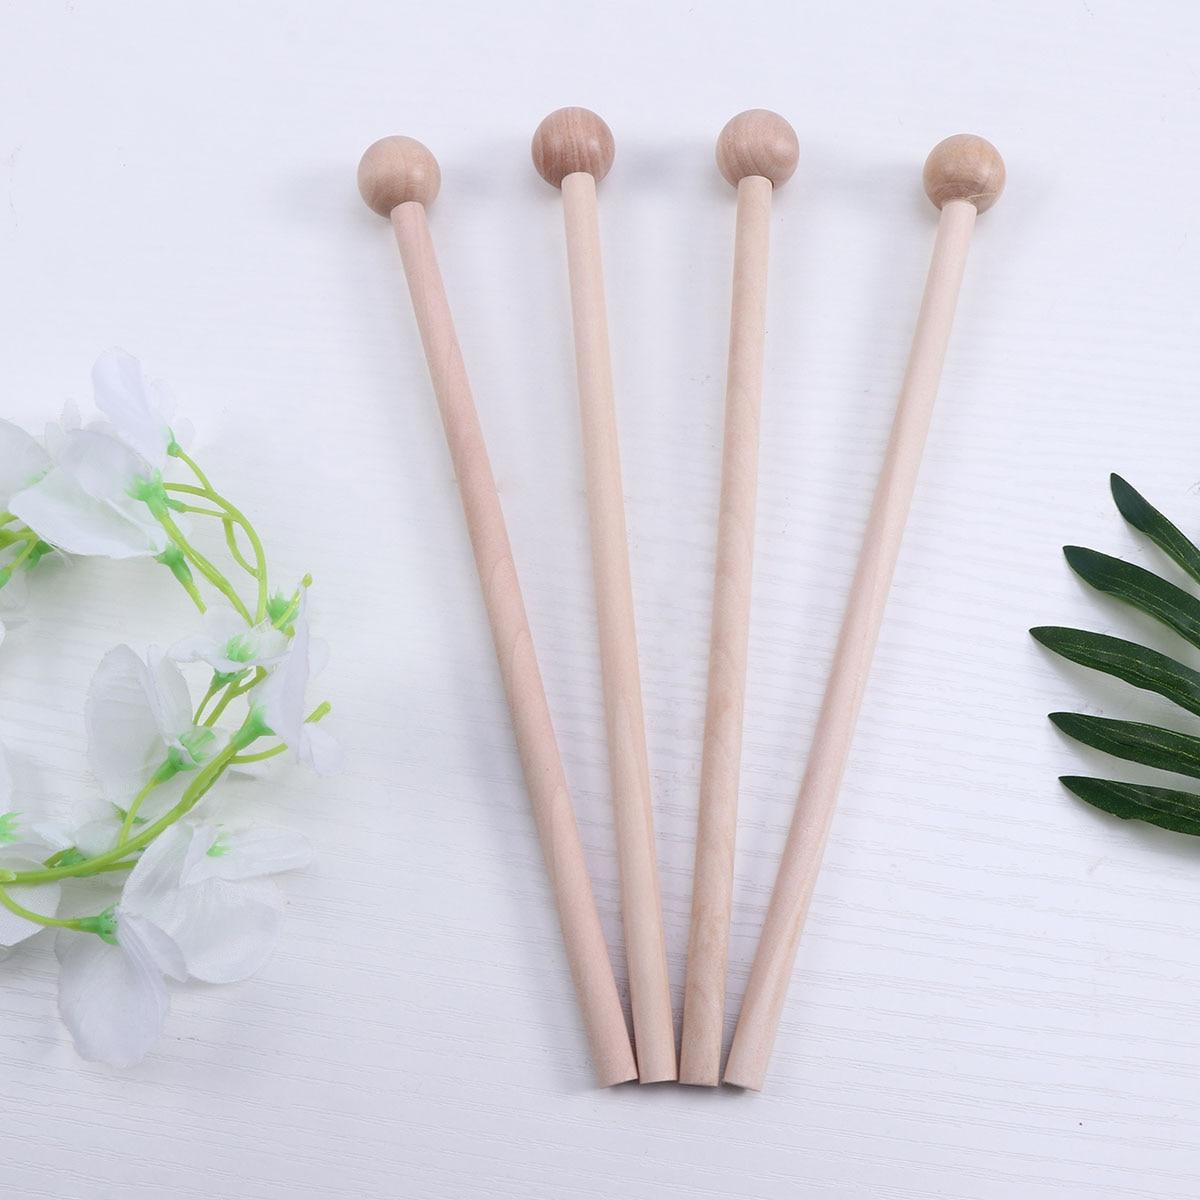 4pcs Drumsticks Wooden Drum Sticks Wood Mallets Percussion Sticks Musical Percussion Instrument Accessories